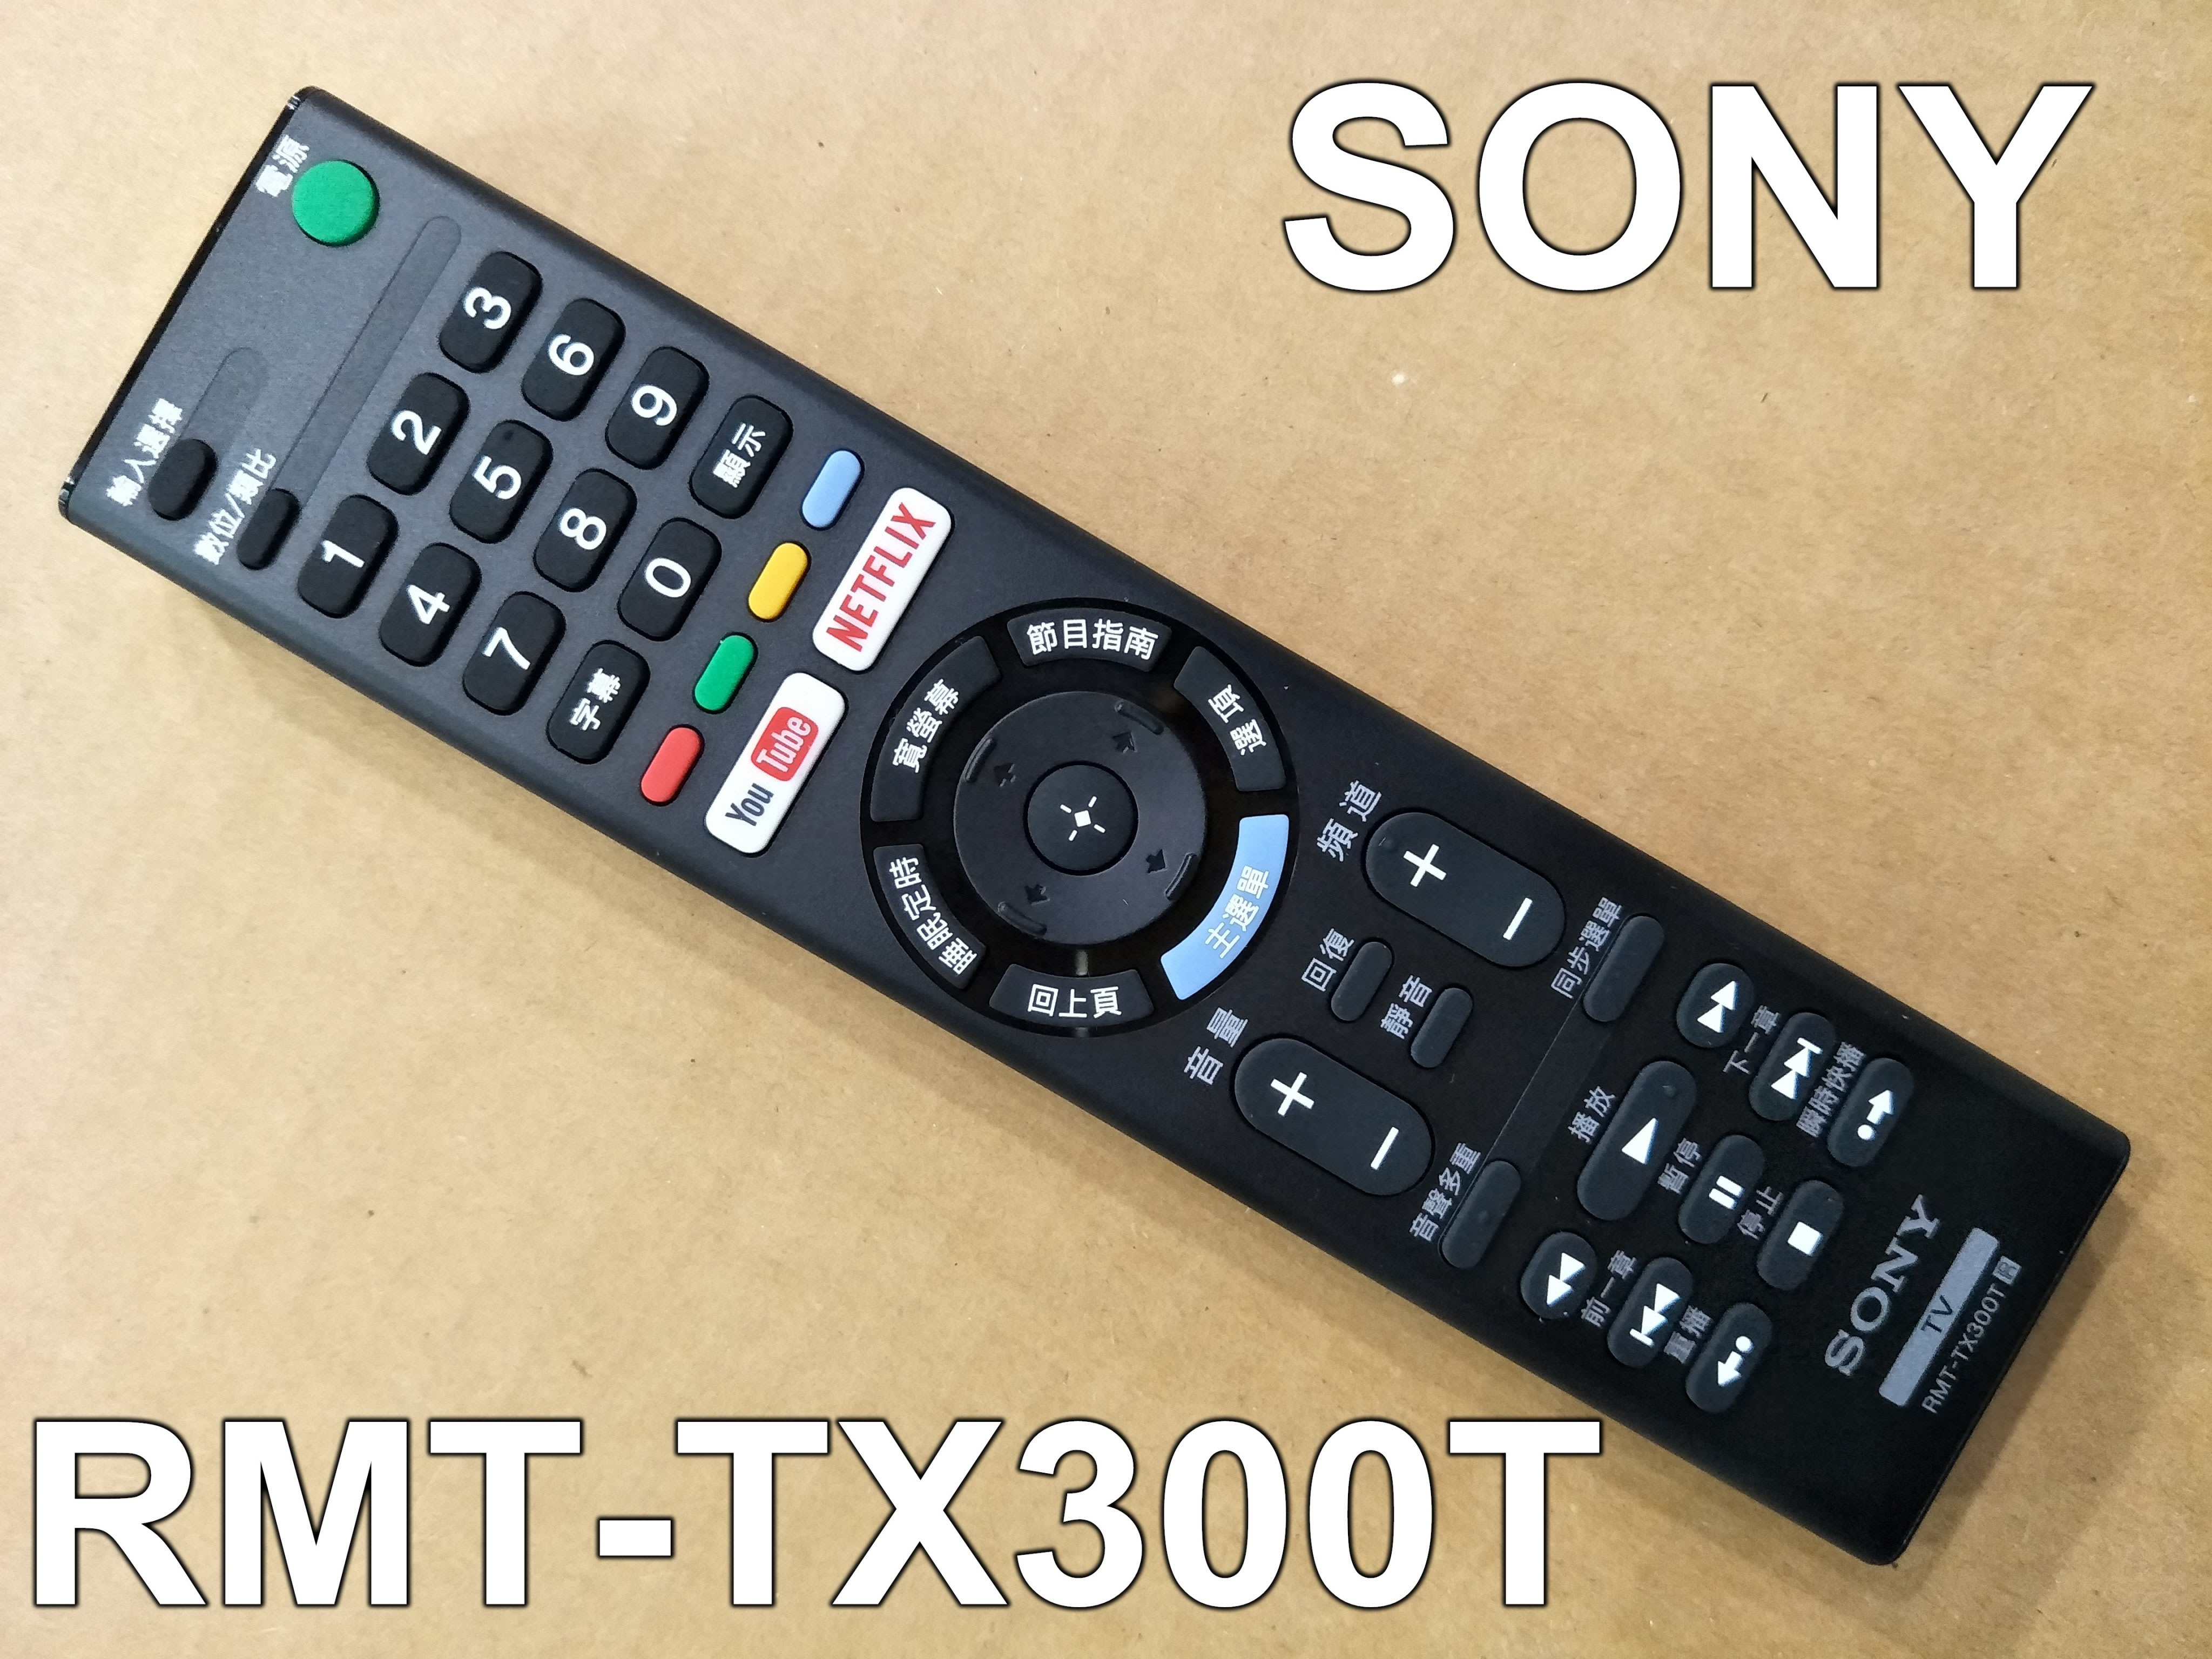 SONY 原廠遙控器  RMT-TX300T 適用 KD-43X7000E , KD-49X7000E